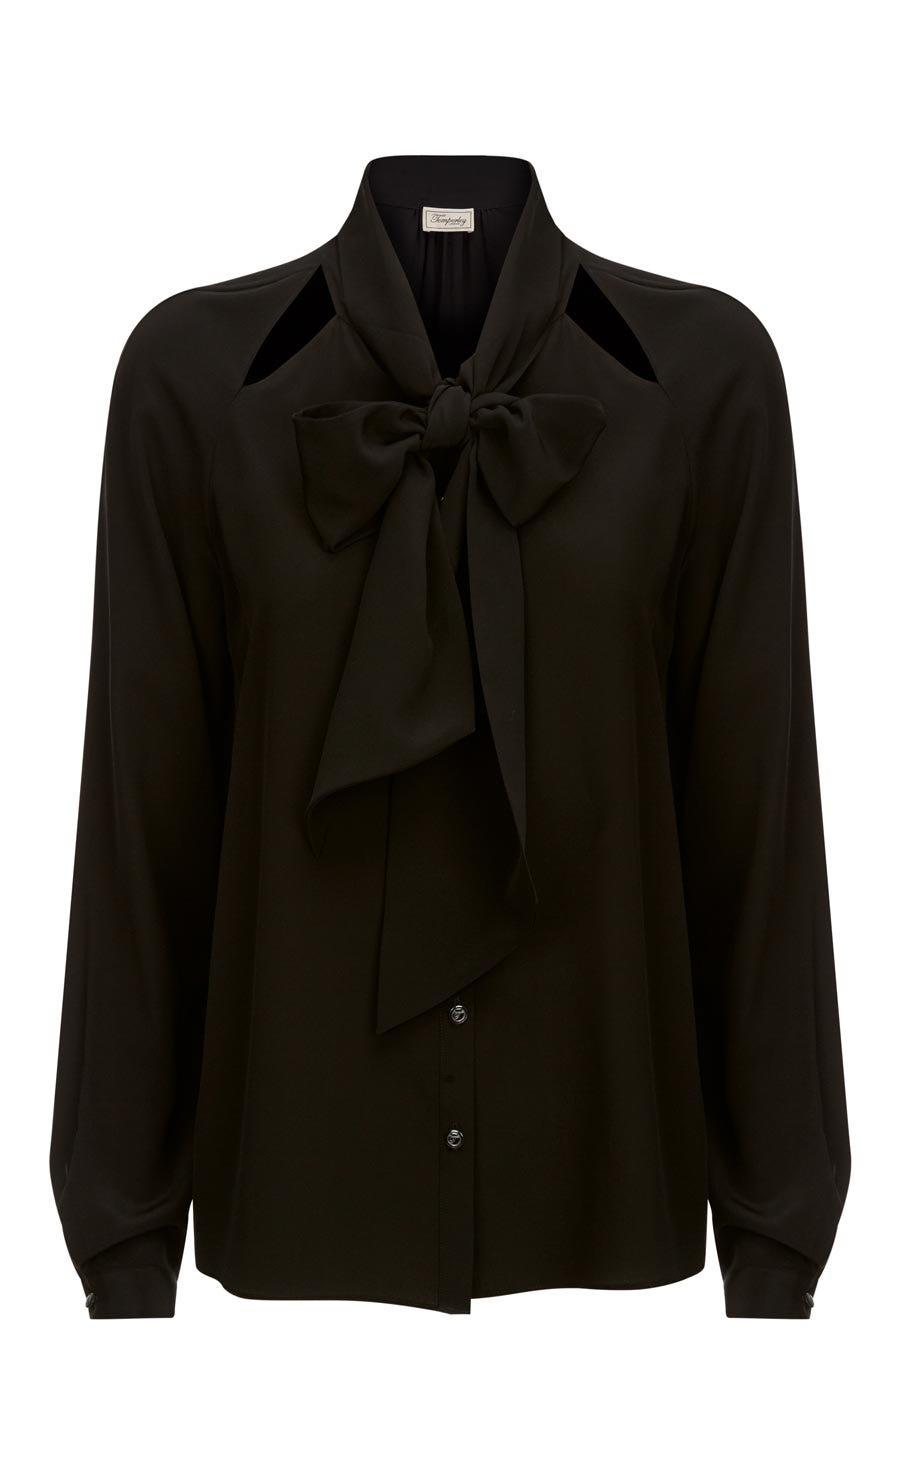 Purity Bow Shirt, Black